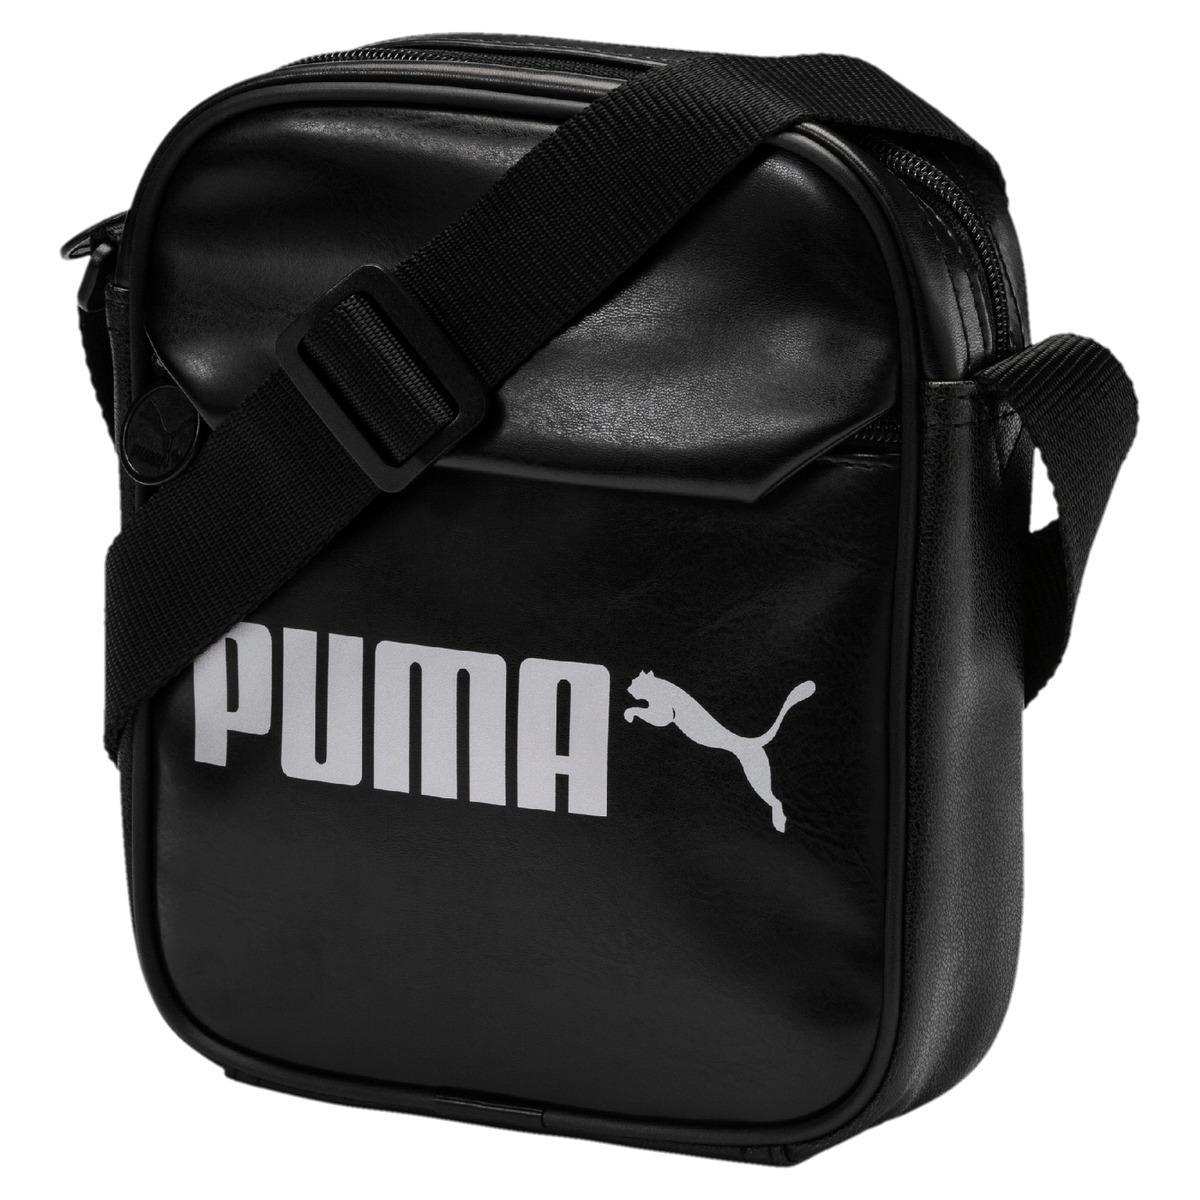 PUMA Campus Portable Bag in Black for Men - Lyst 7839041914a0a